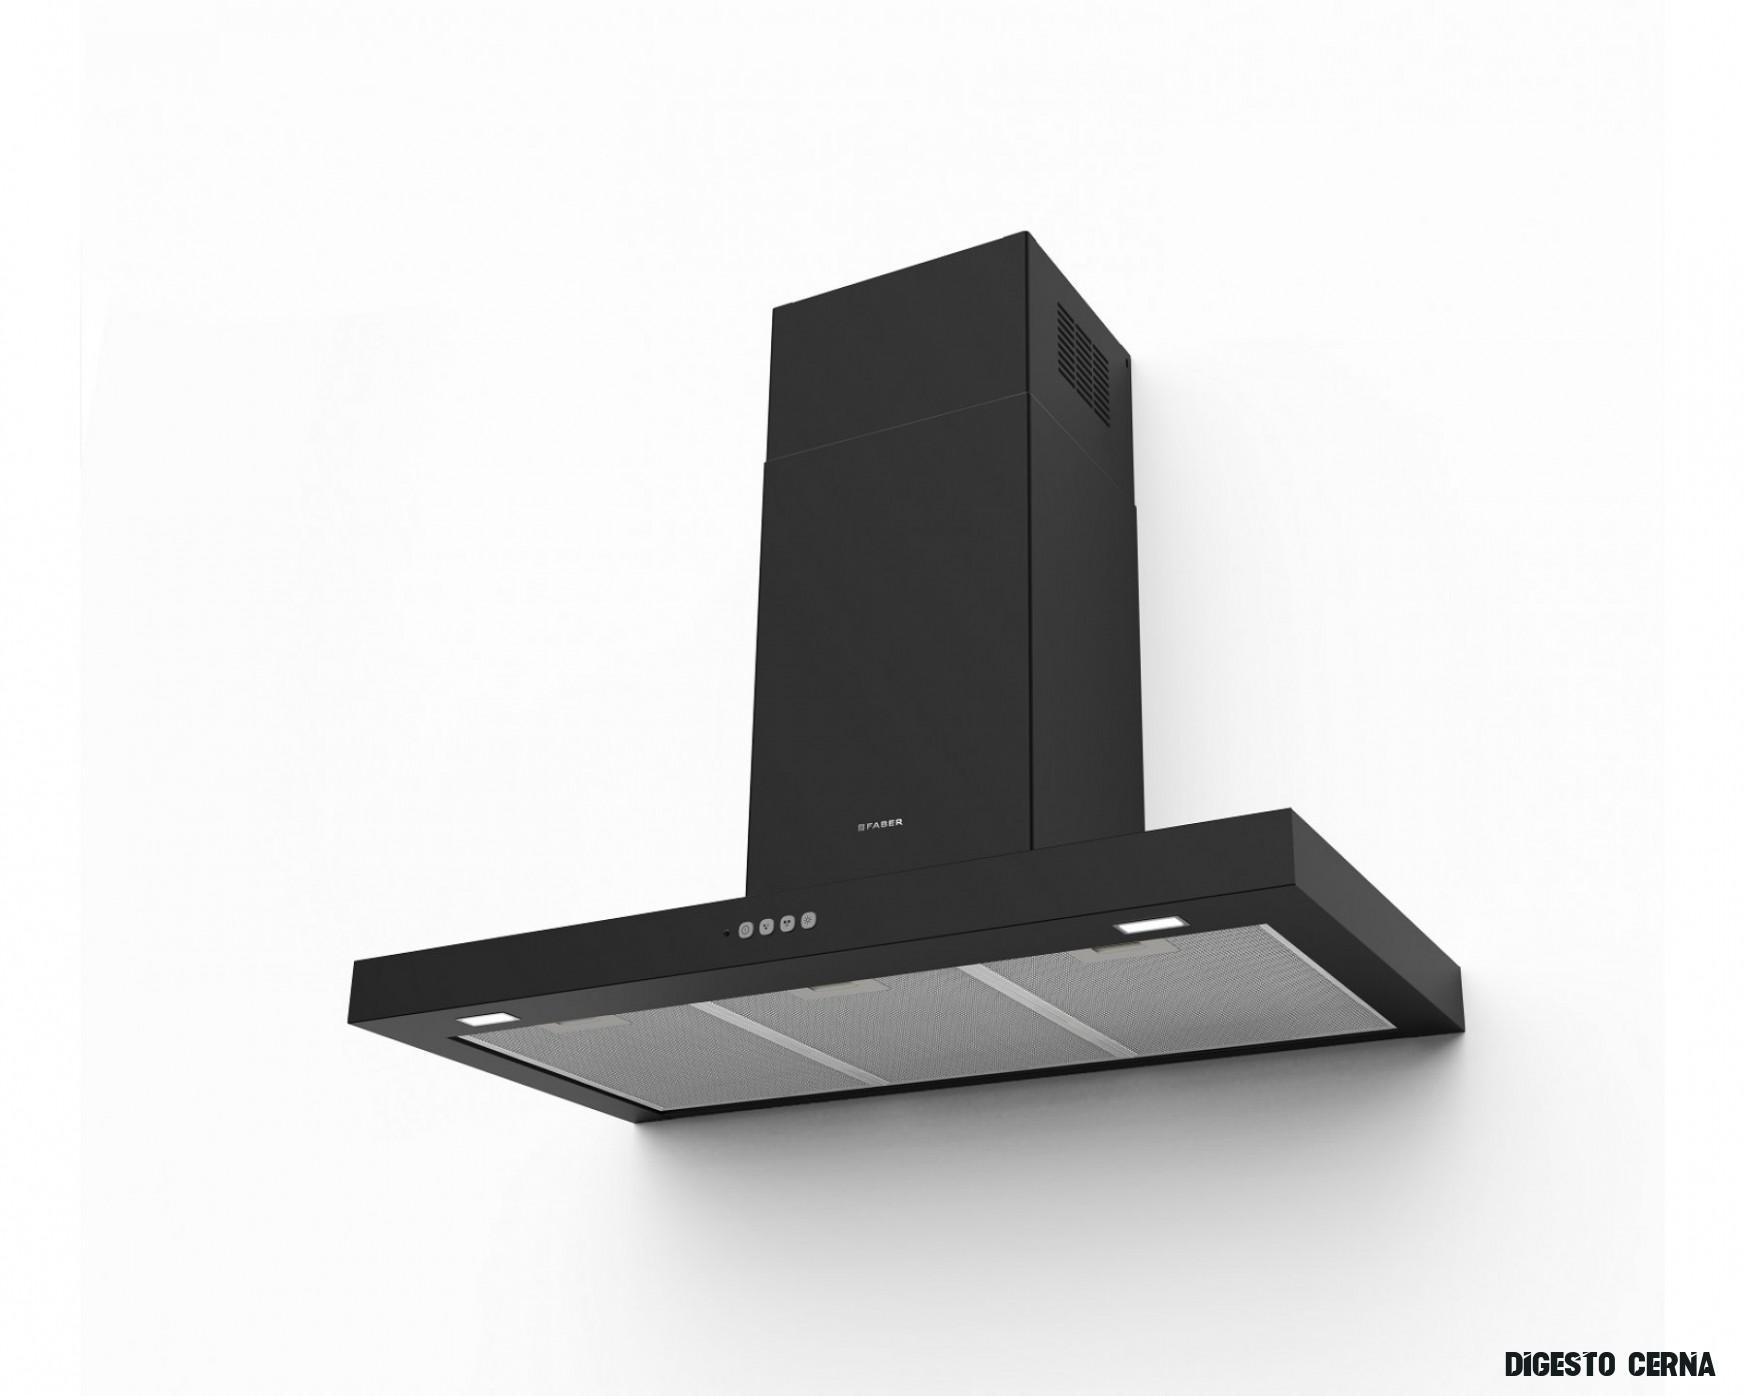 Komínová digestoř 11cm Faber Stilo Comfort BK MATT A11, černá mat